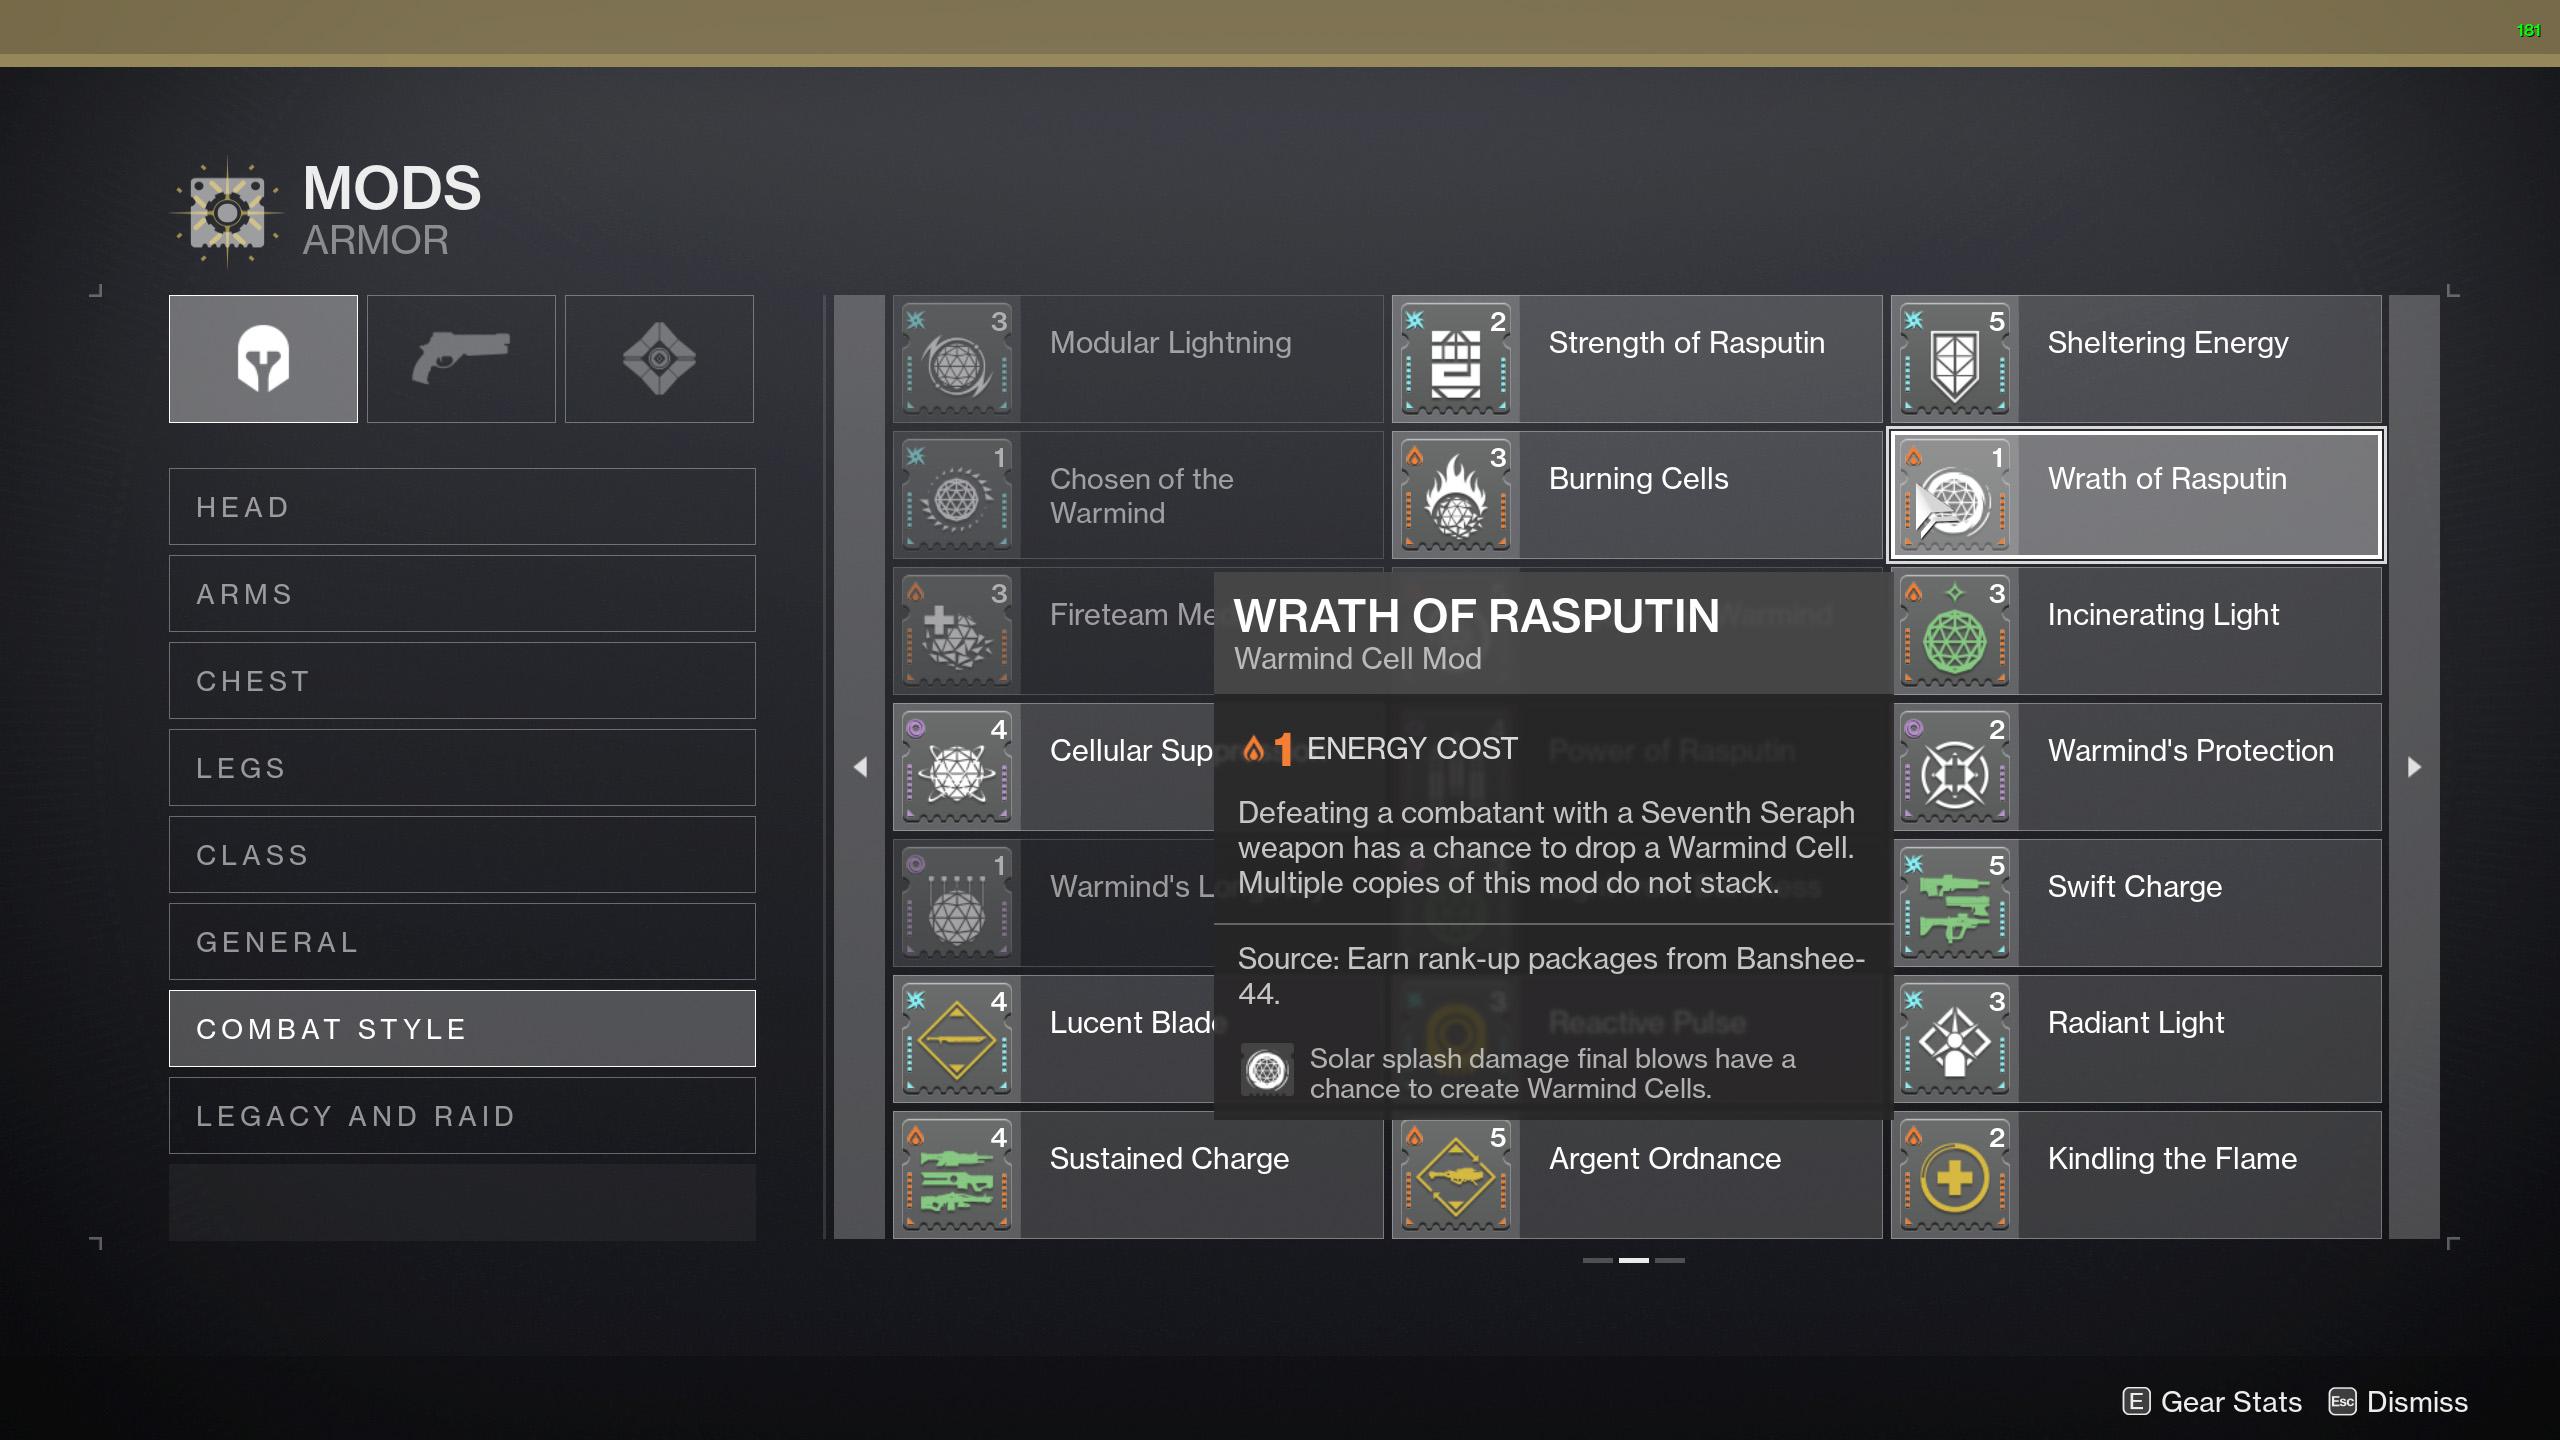 destiny 2 battle of mantle harmony build